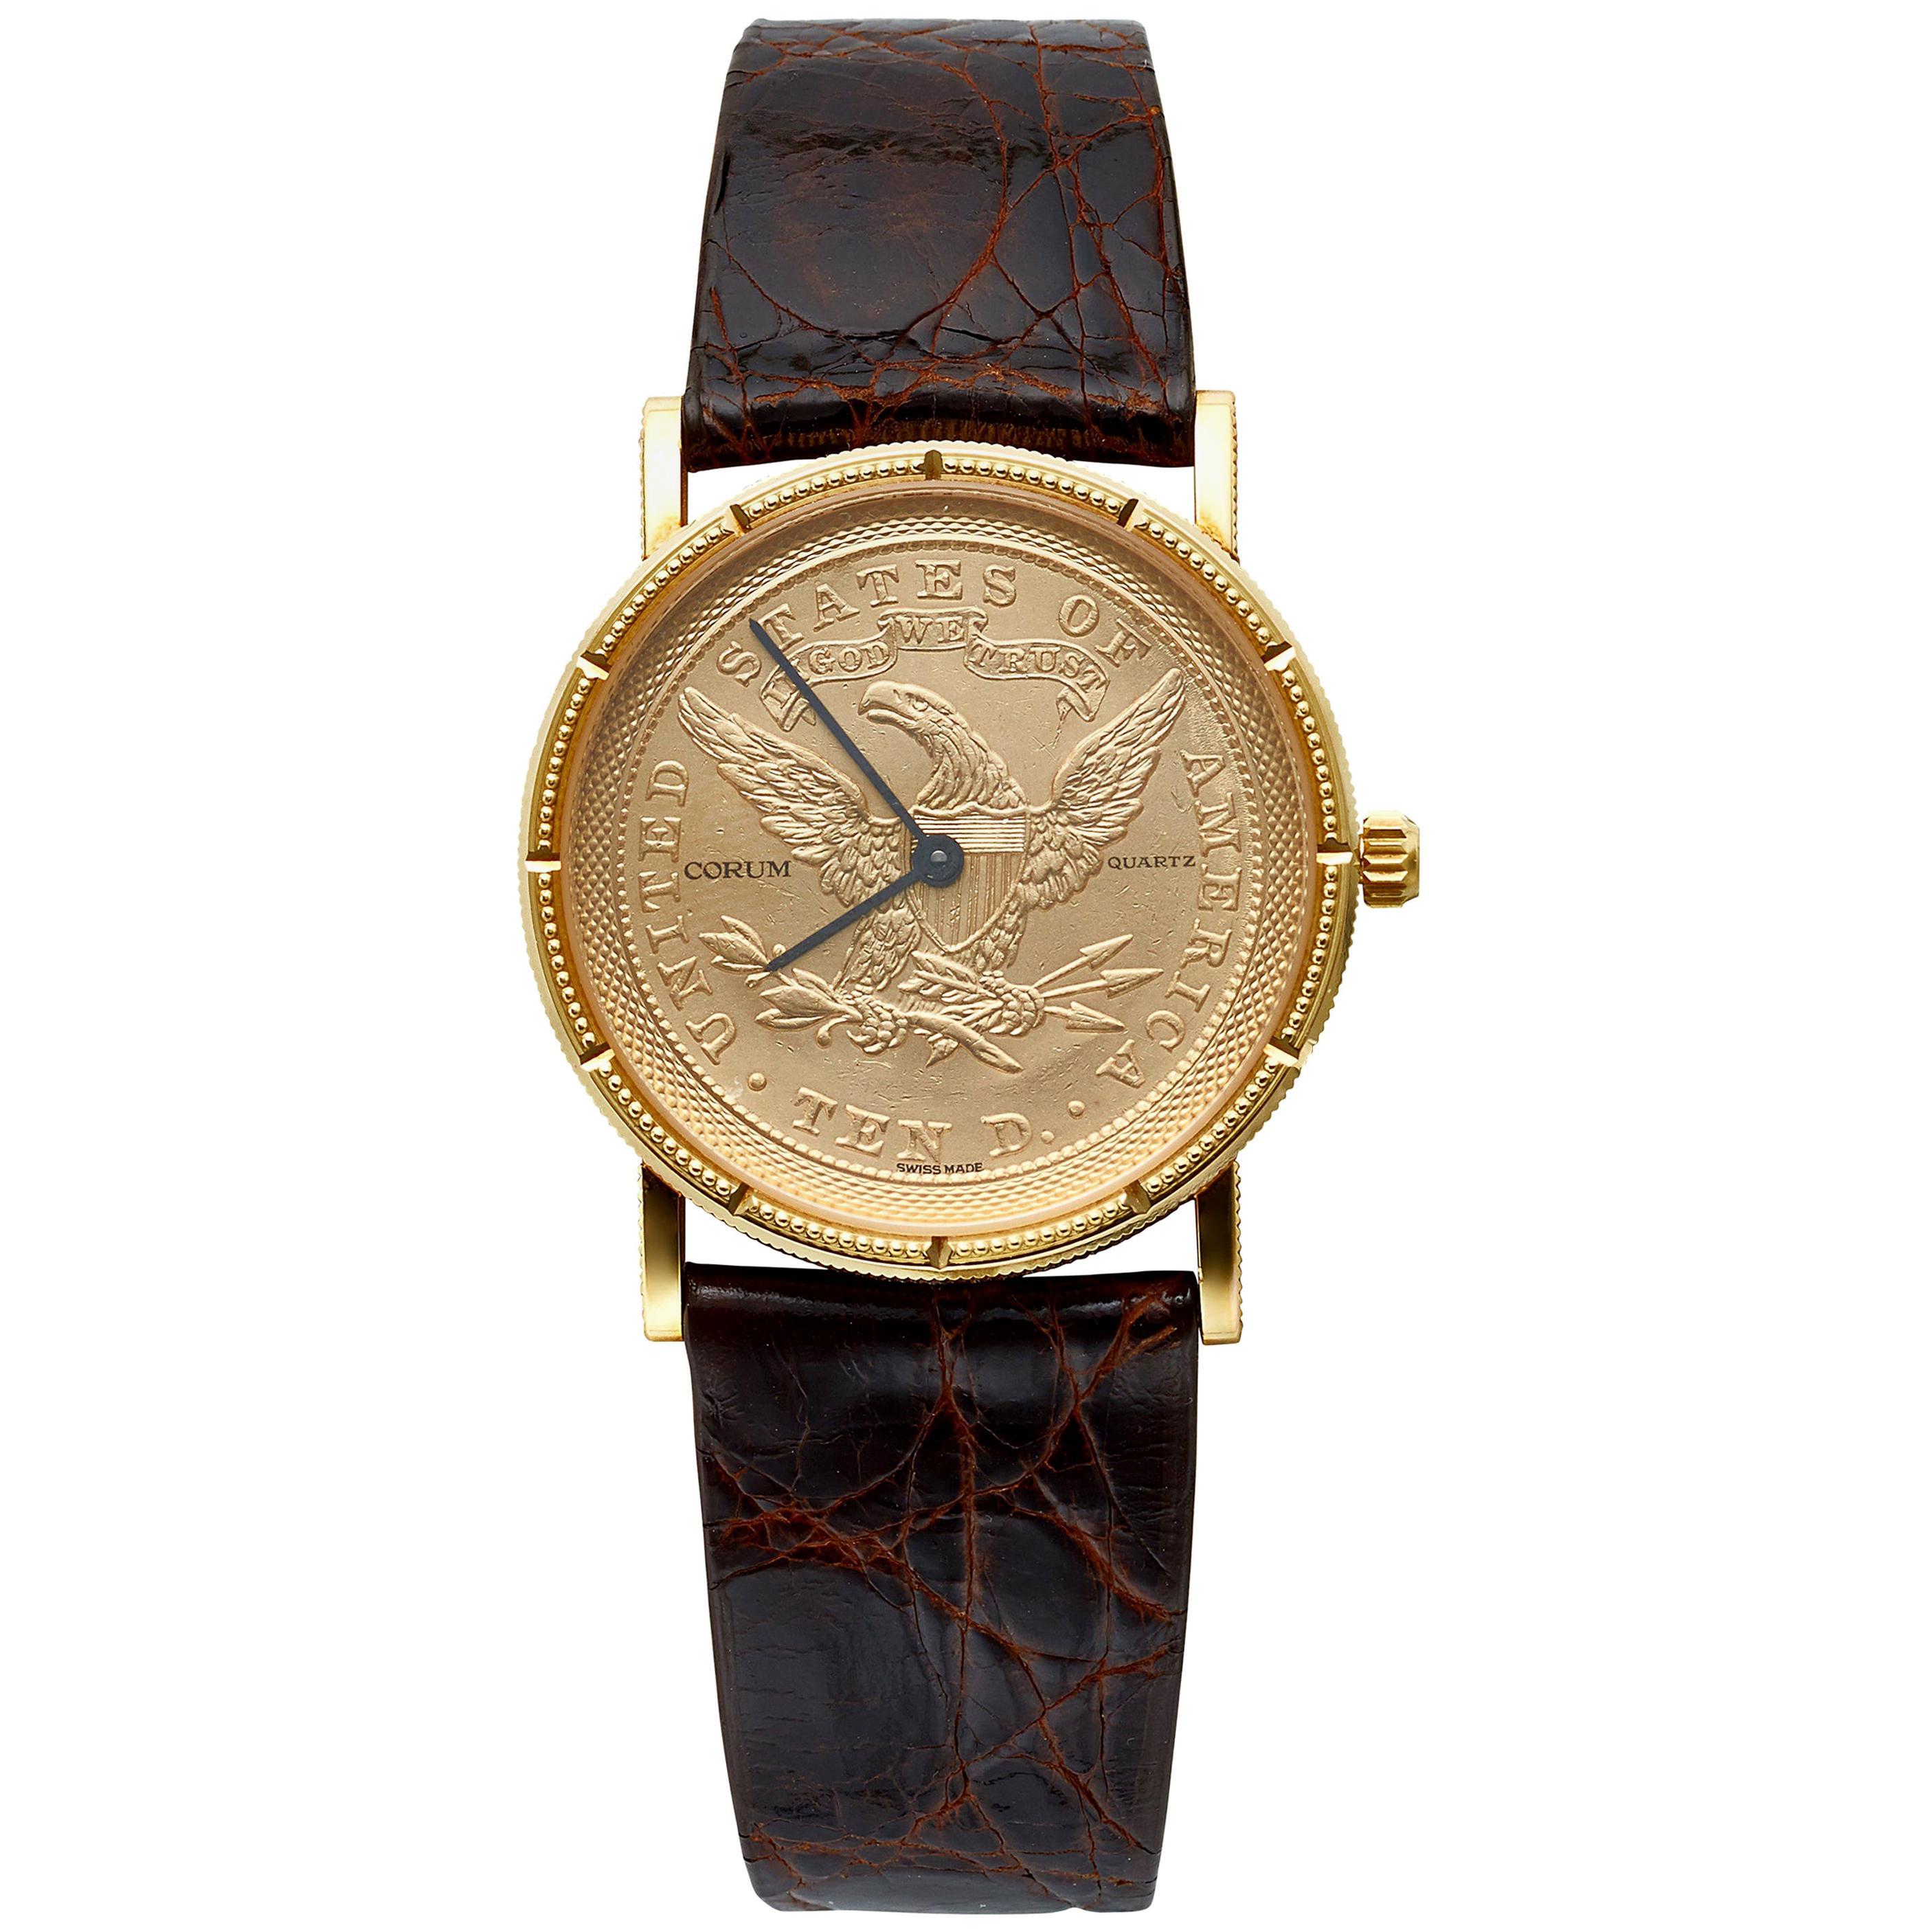 Corum 18 Karat Yellow Gold 10 Dollar 1865 Coin Watch